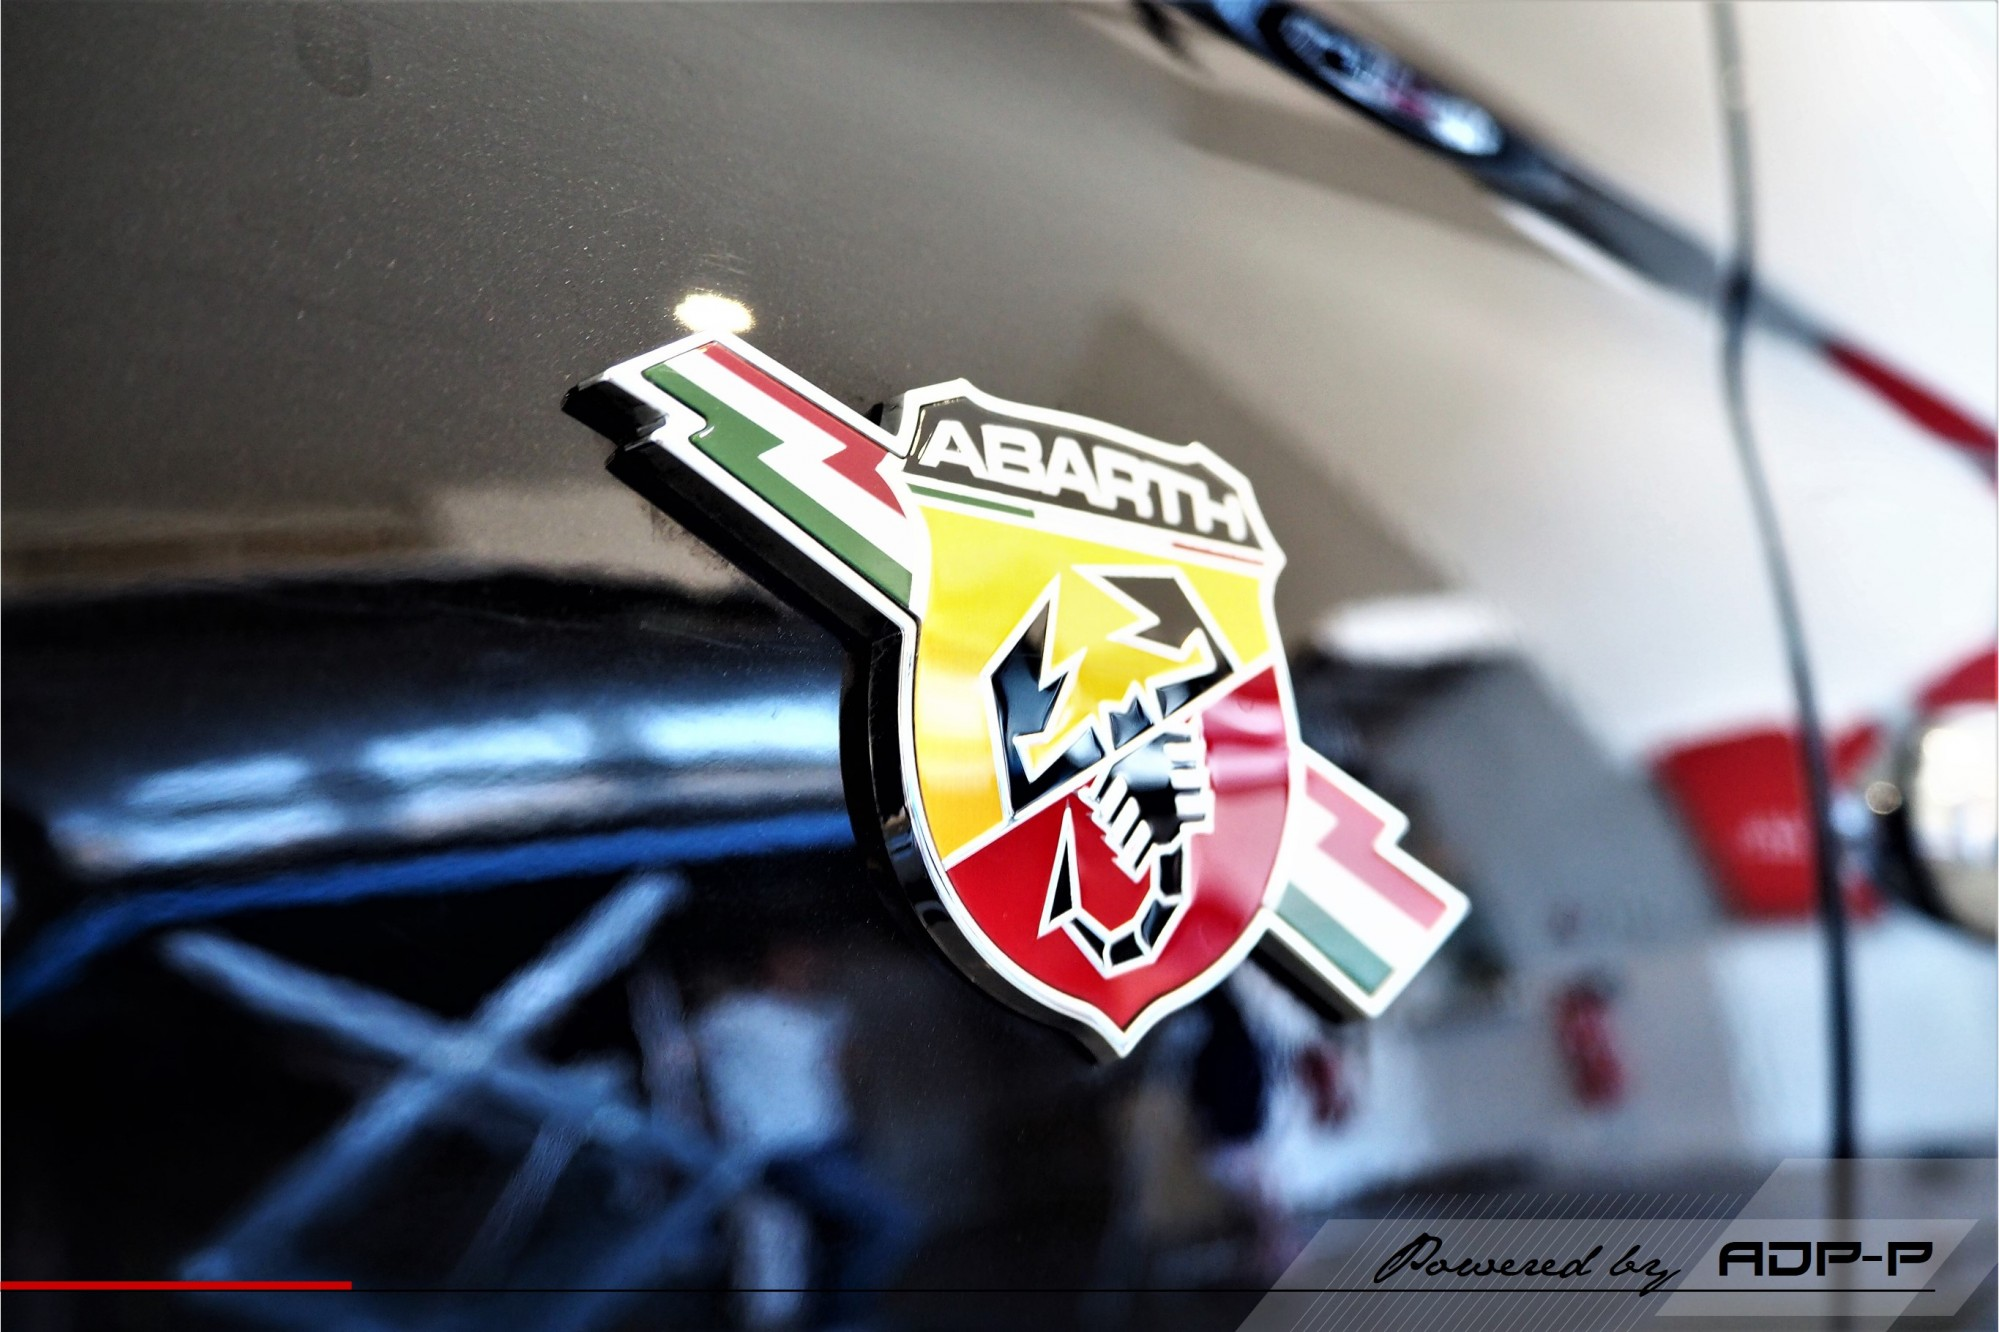 Reprogrammation moteur St Victoret - Fiat 500 Abarth 1.4 Tjet 135cv - ADP Performance